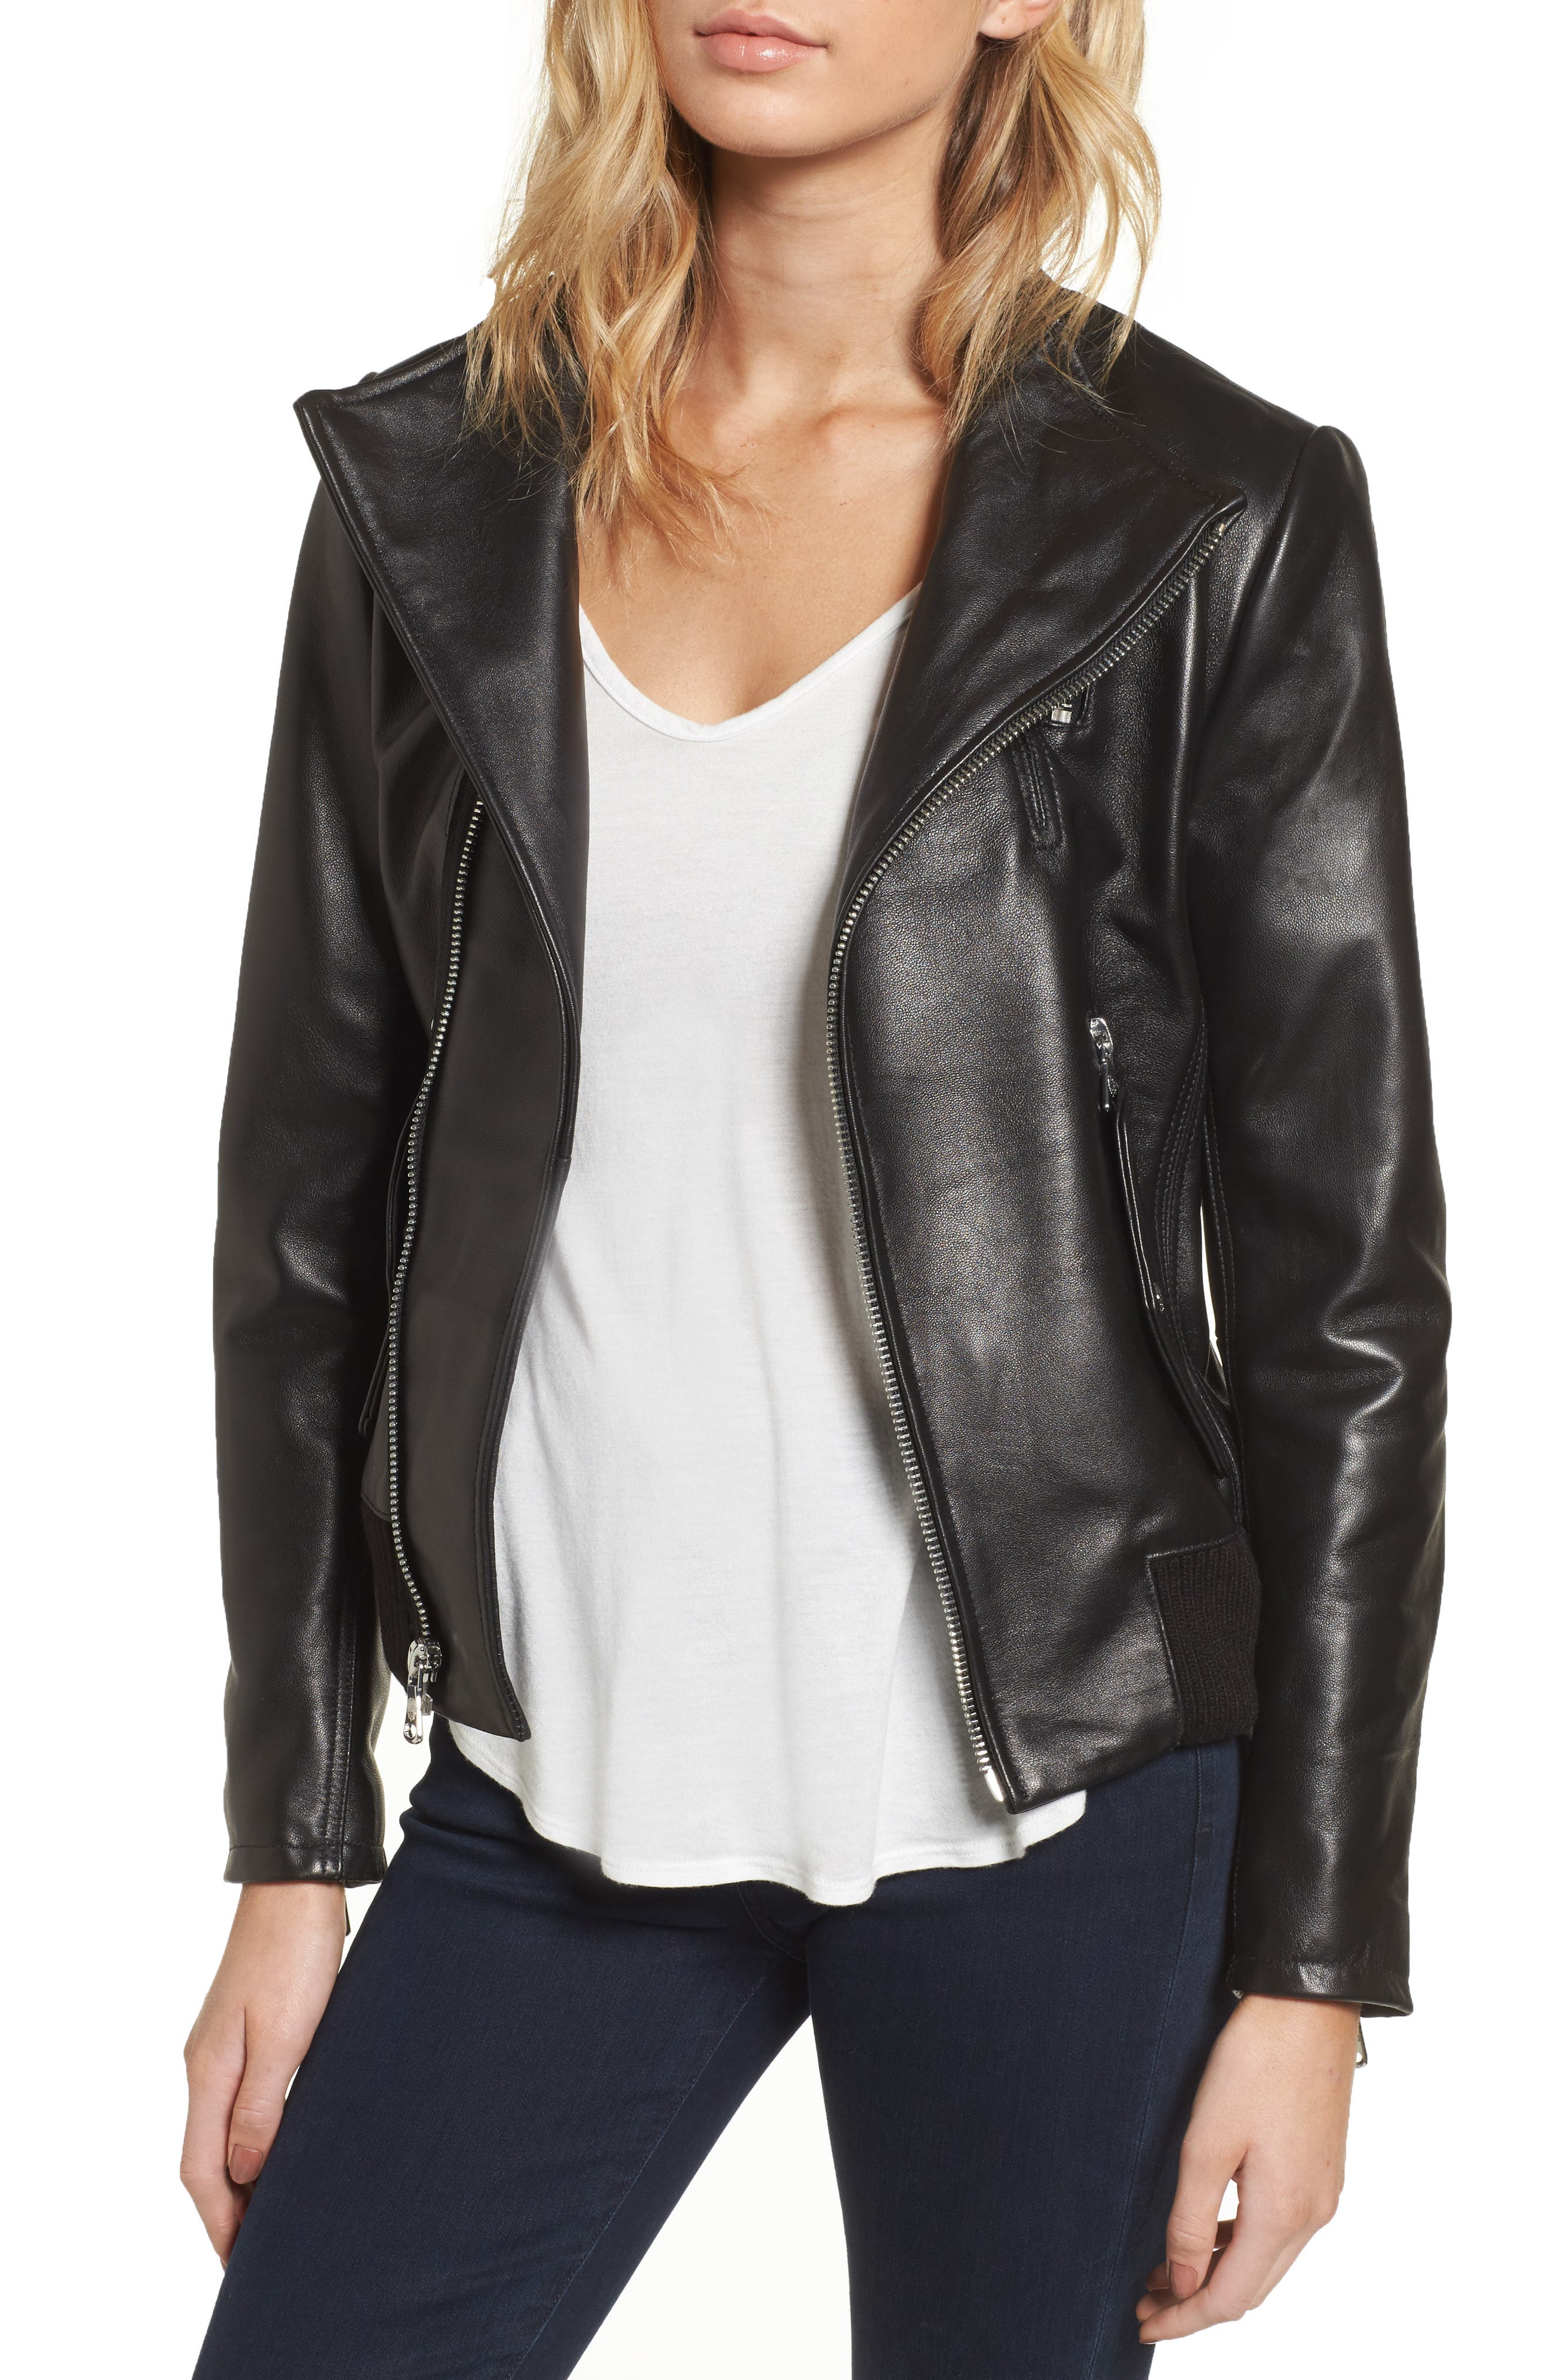 Main Image - Vince Camuto Leather Bomber Jacket